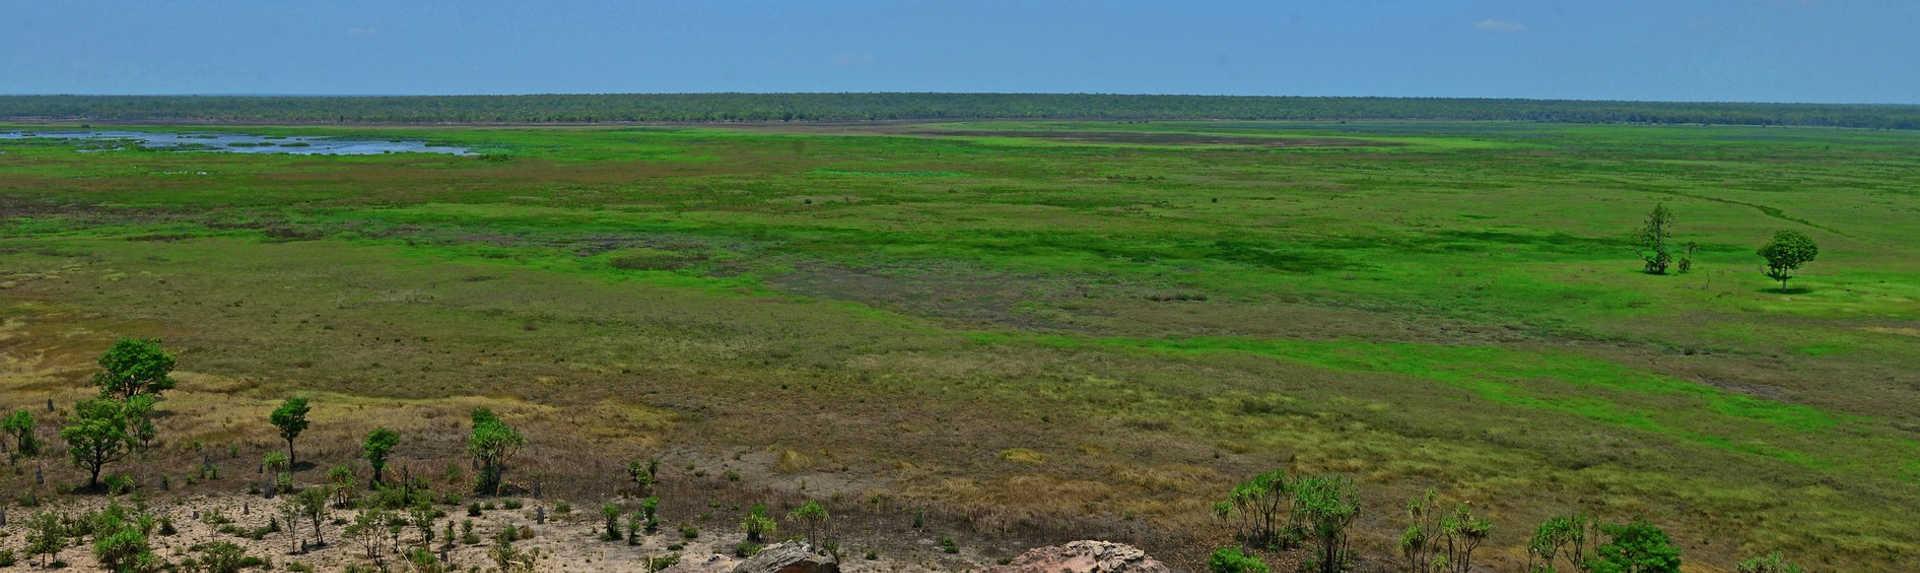 Do I need a permit to visit Kakadu?